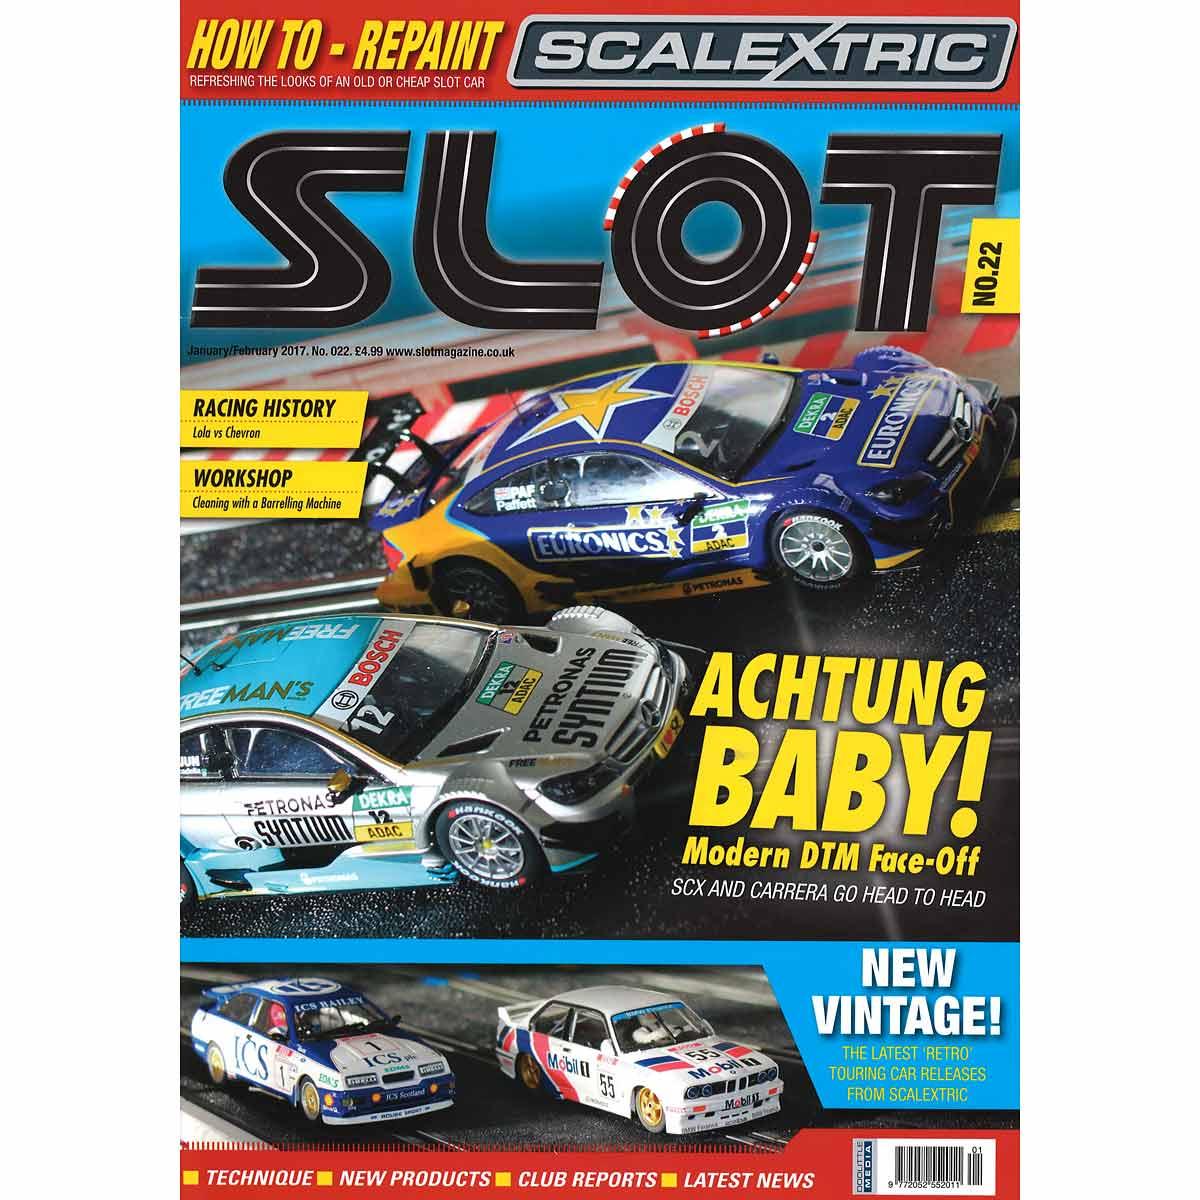 Slots magazines